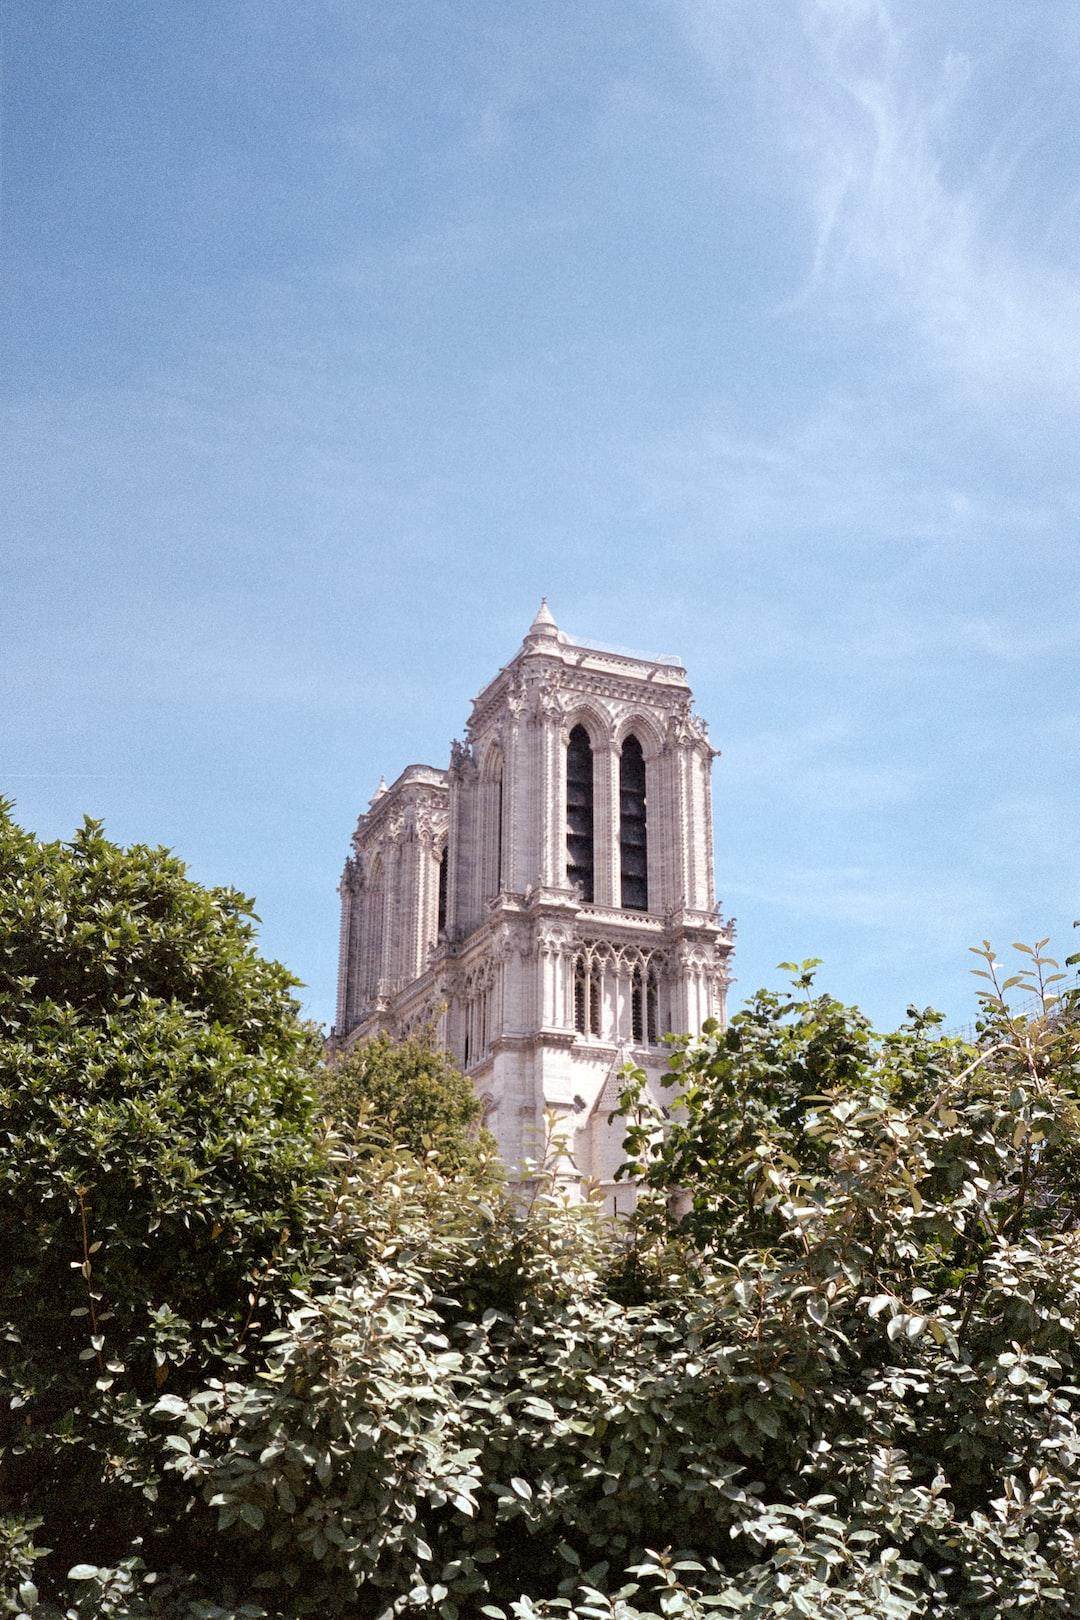 Notre Dame  Fujifilm x-tra 400 35mm film